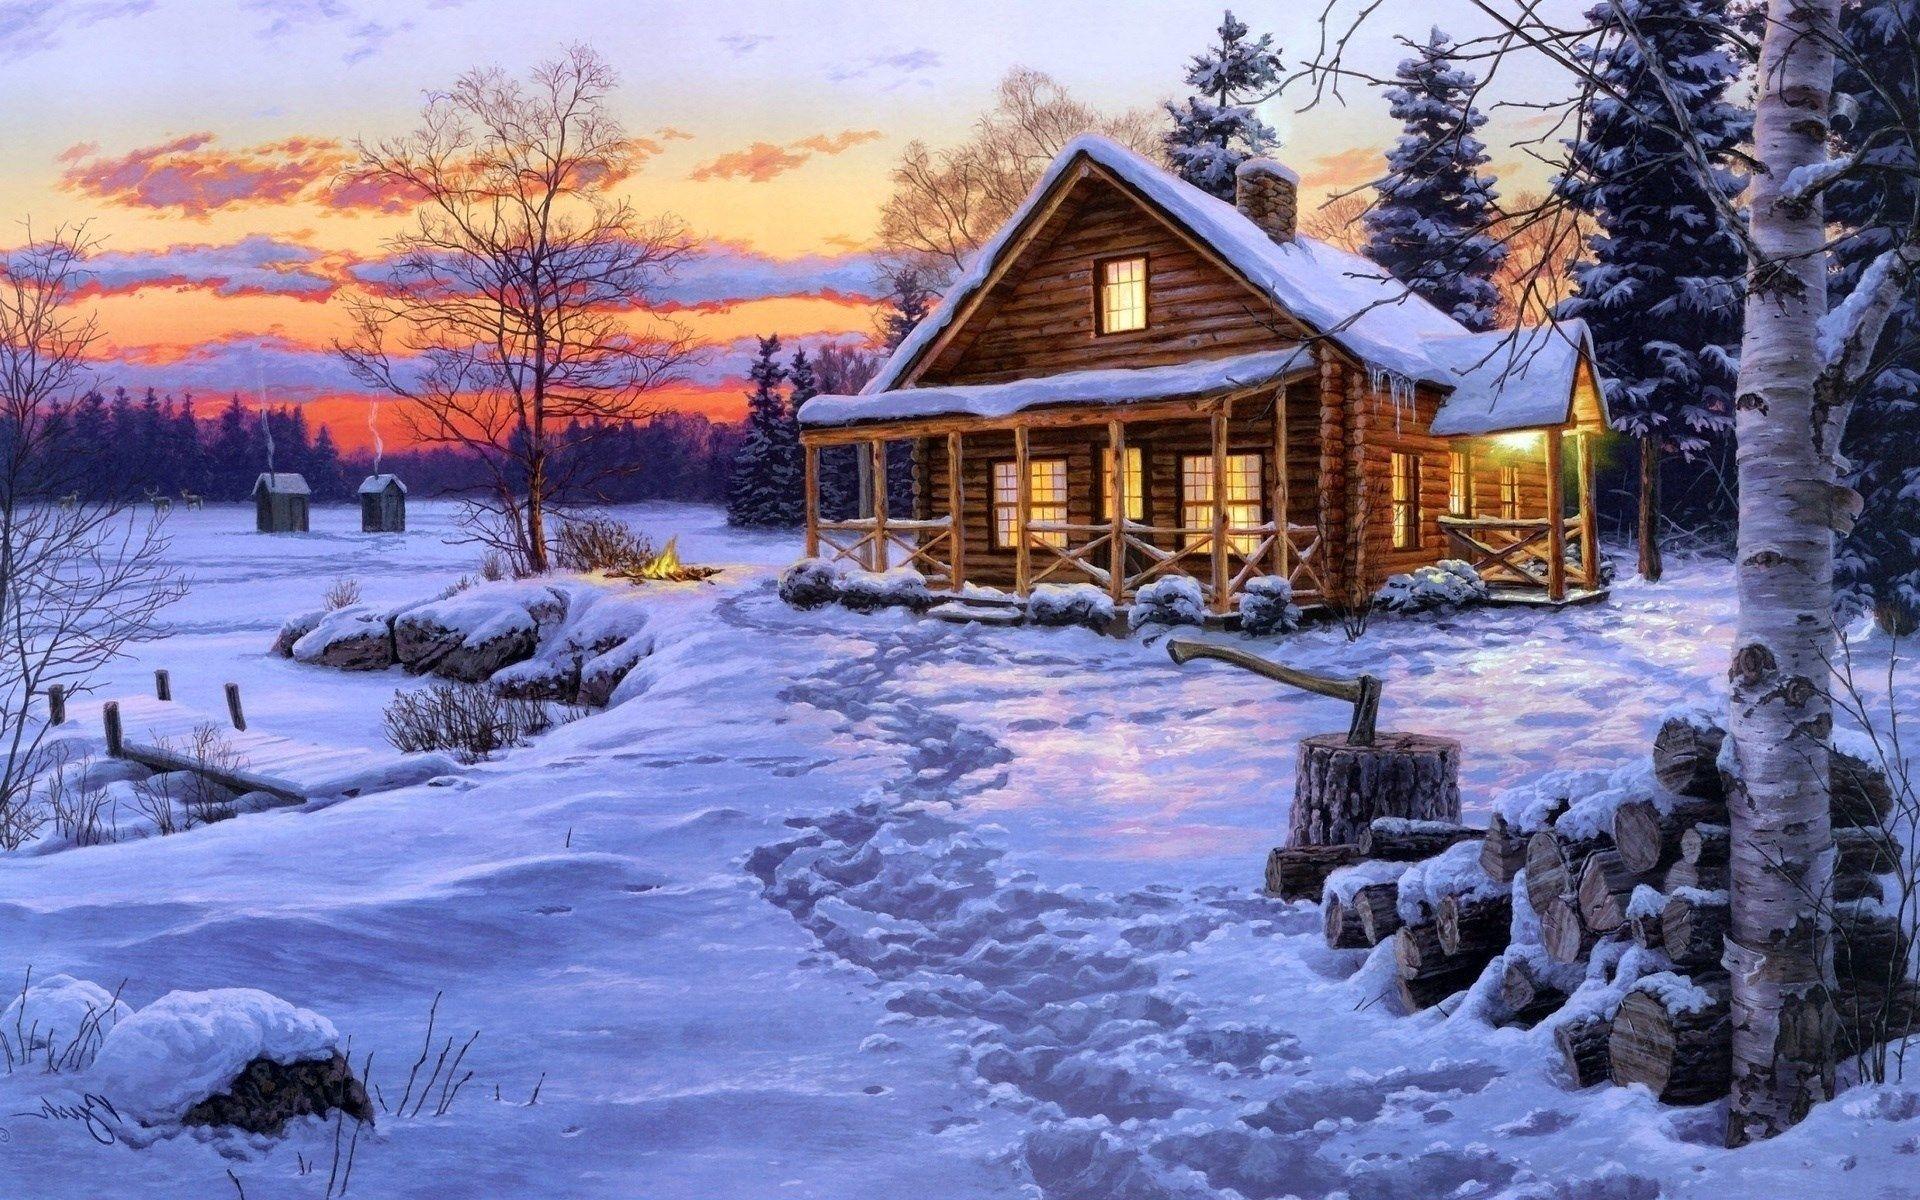 Winter Cabin Wallpaper (72+ images)